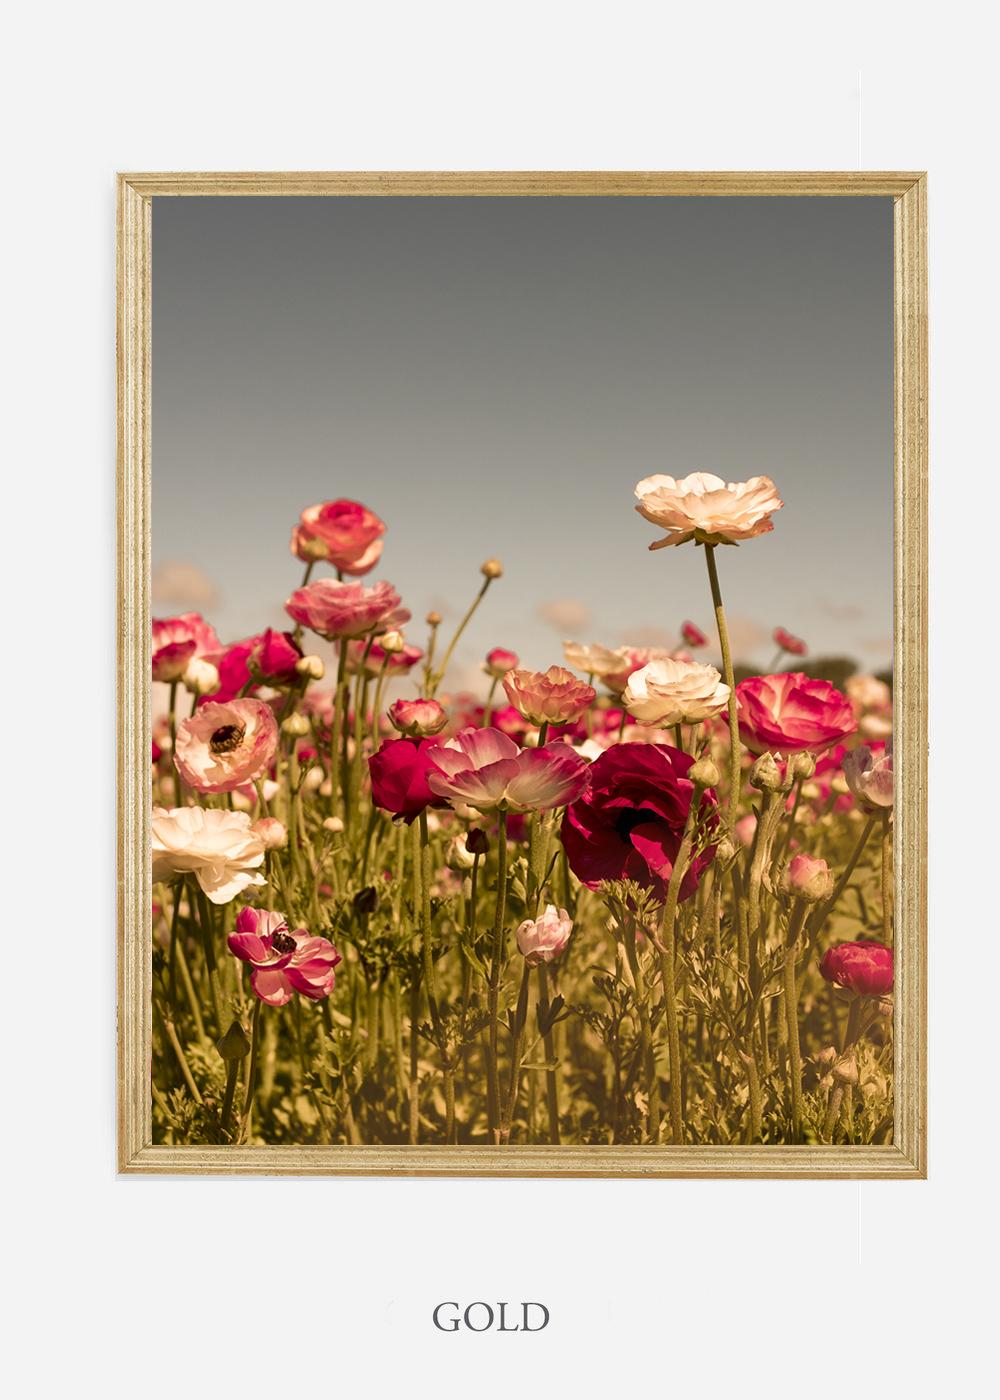 wilder-california-Floral-No.3-gold-frame-no-mat-interior-design-botanical-print-art-floral-art.jpg